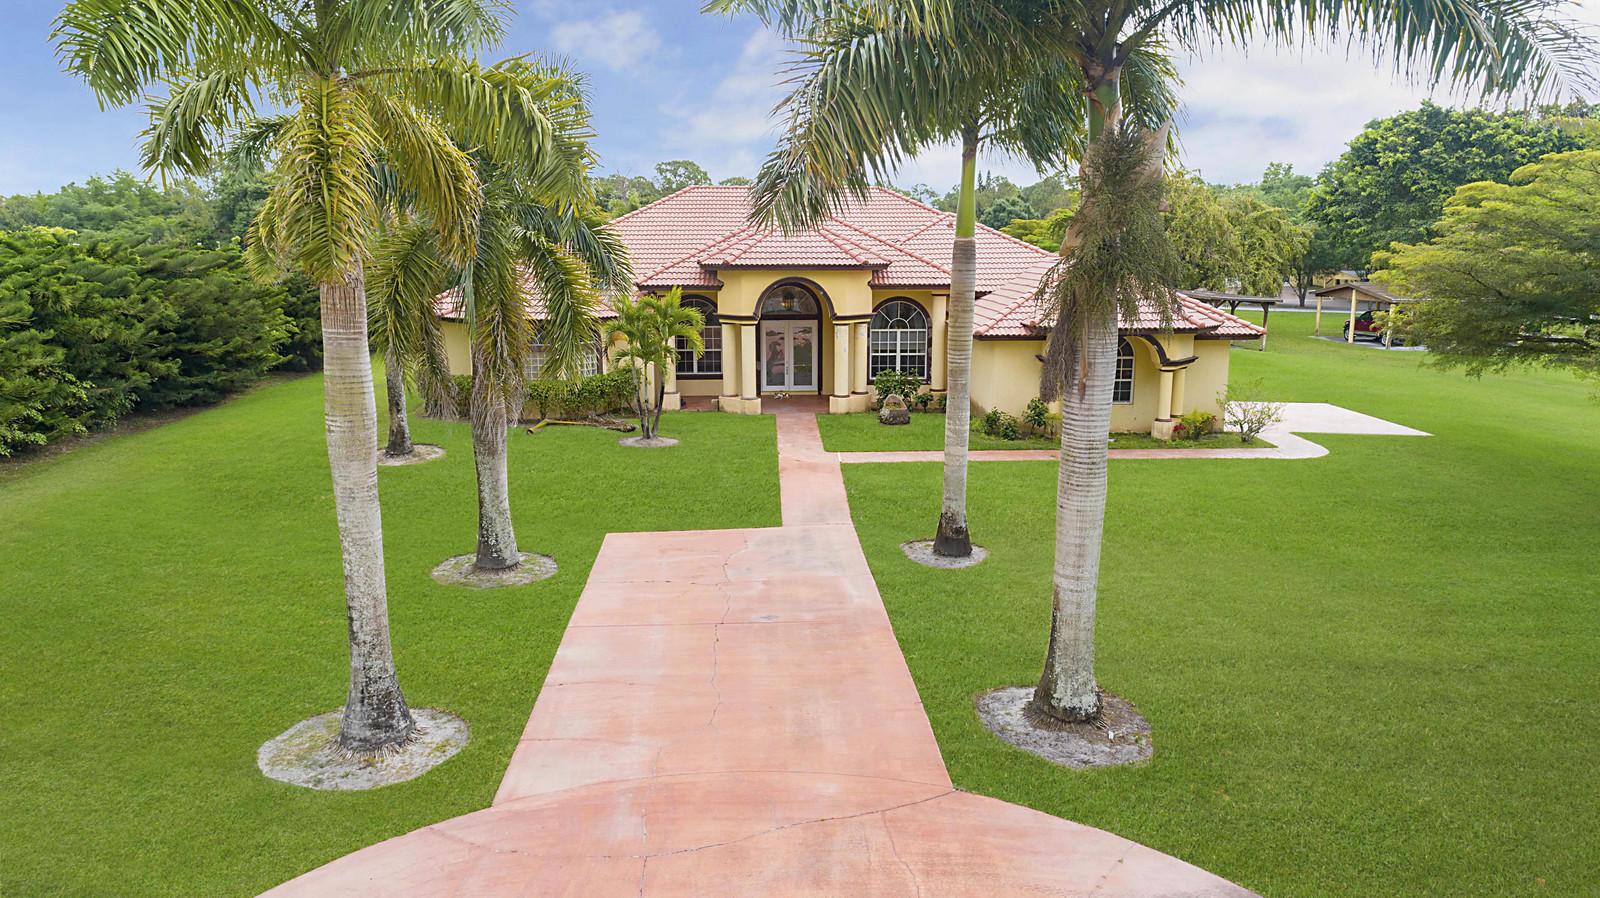 5 Acres 4/3.1 home w/cottage